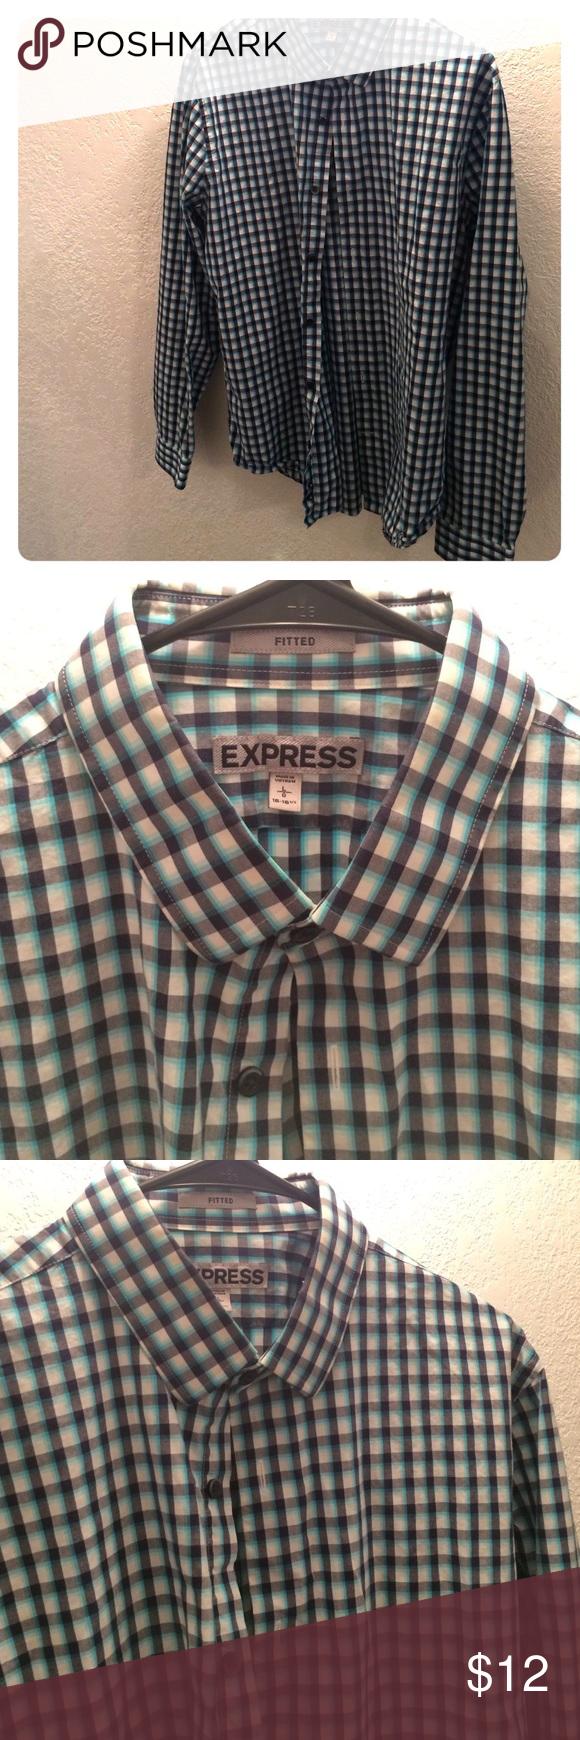 Mess EXPRESS dress shirt Large fitted 16-16 1/2 dress shirt. Like new. Worn only a few times. Express Shirts Dress Shirts